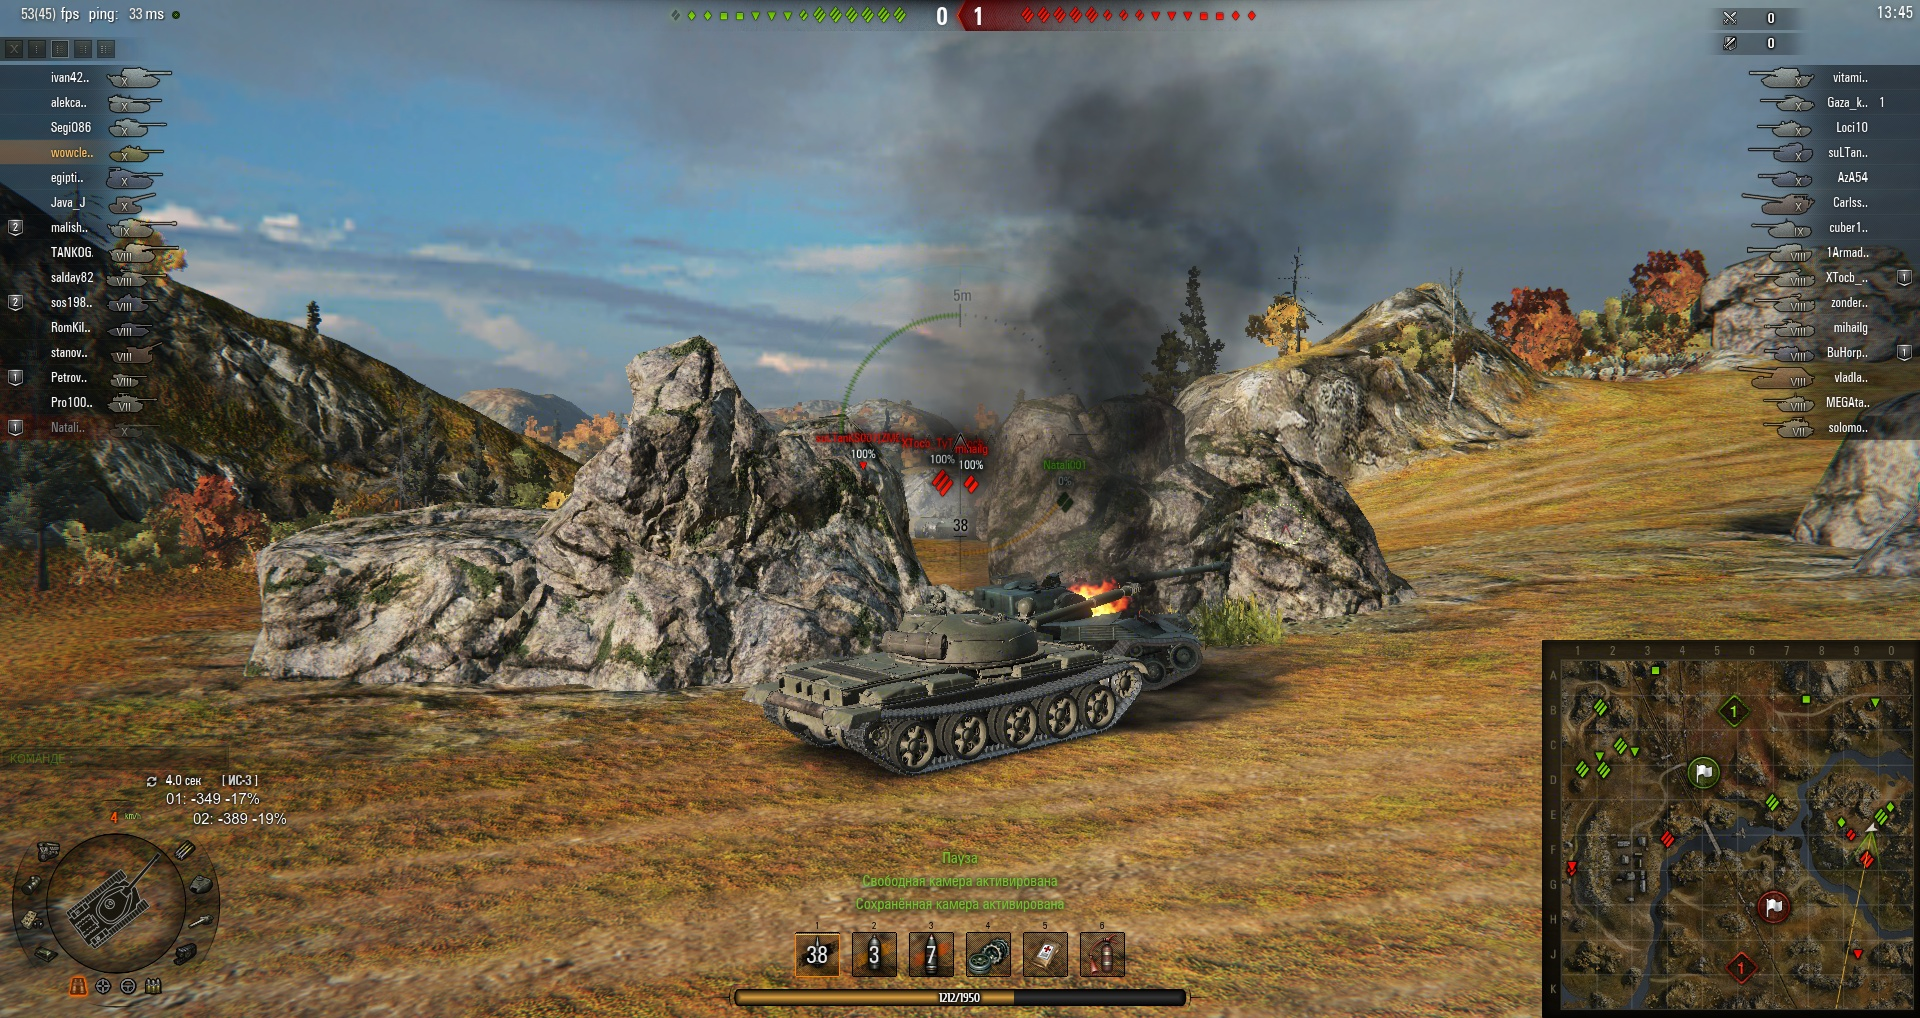 Джава моды для world of tanks скачать